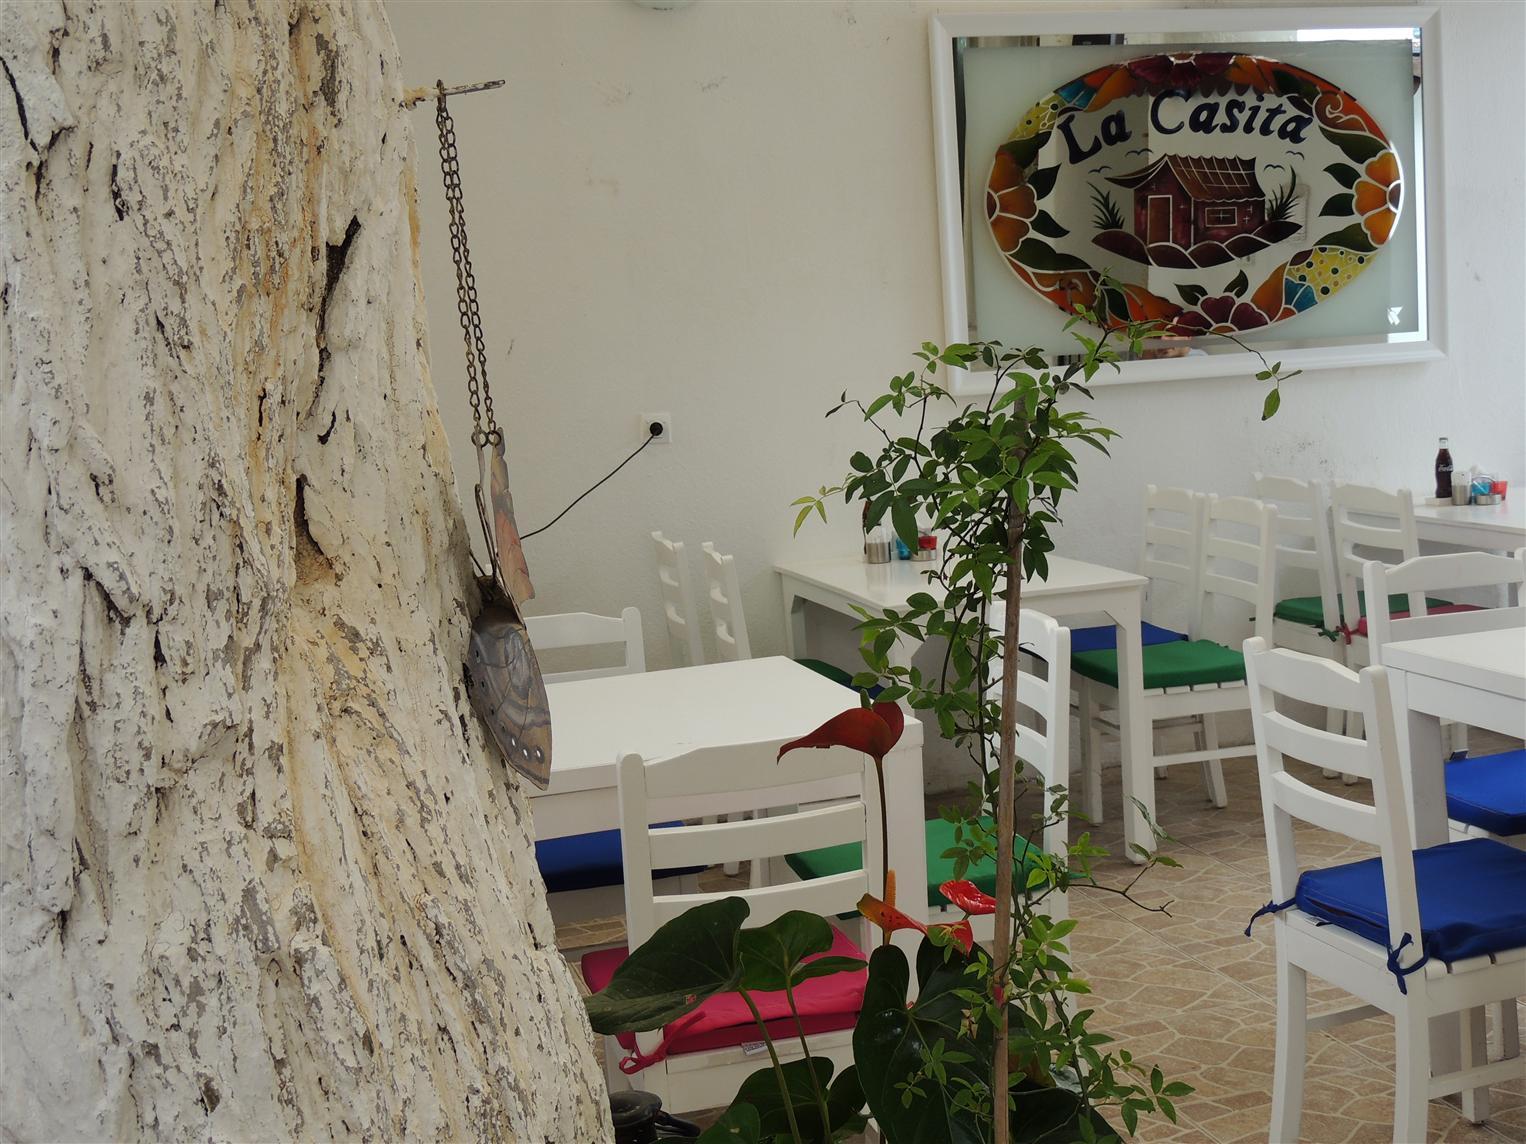 la-casita-cafe201592285031989.jpg izmir vitray çalışması